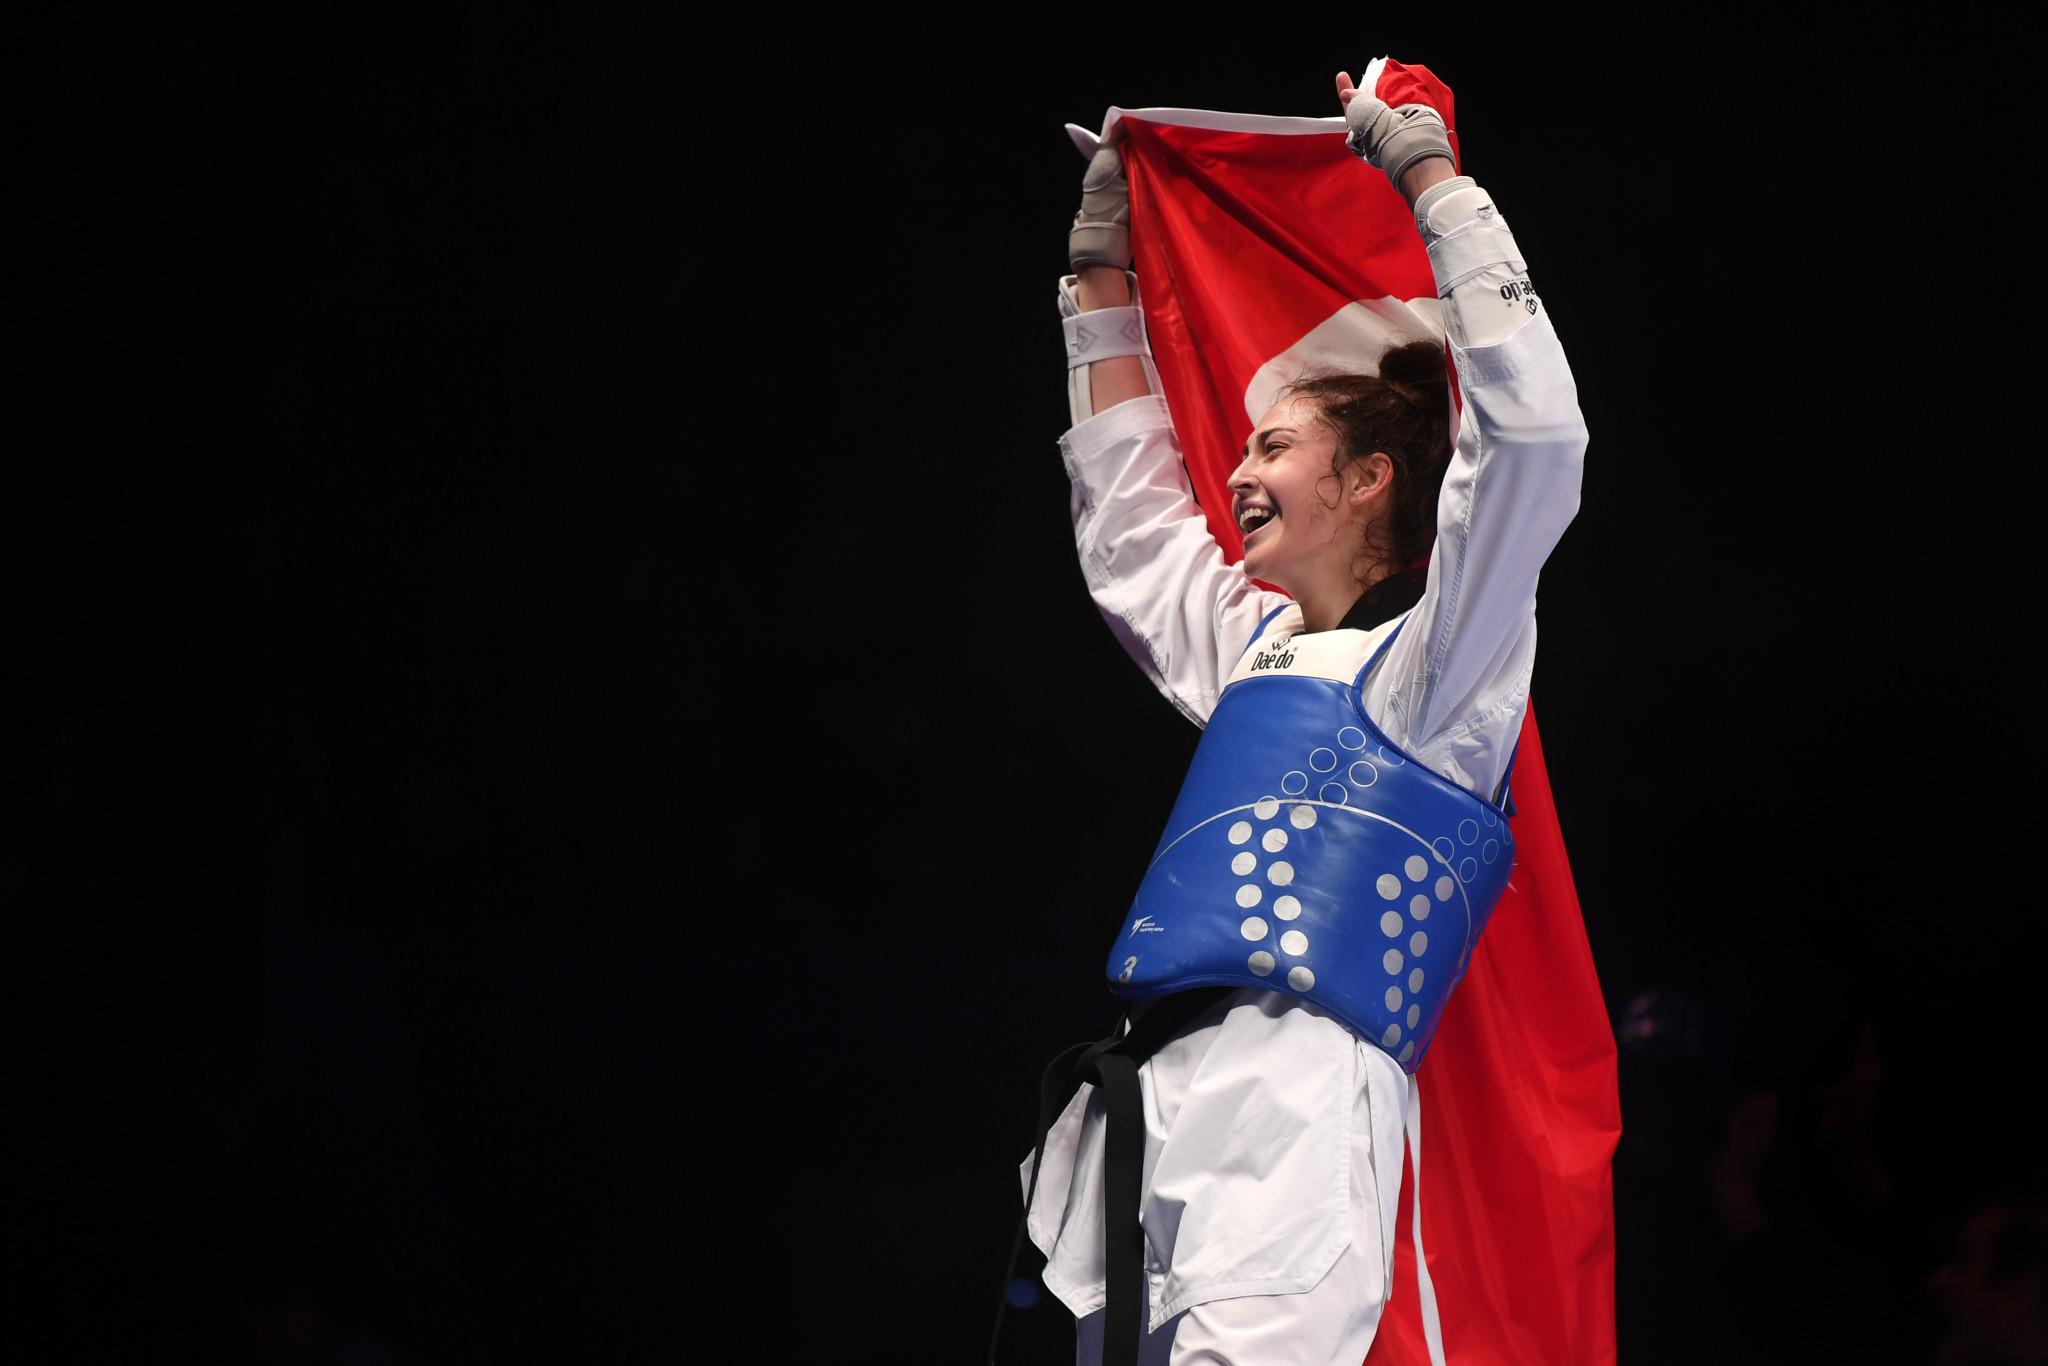 Double Olympic gold medallist Jones defeated at G4 Extra European Taekwondo Championships